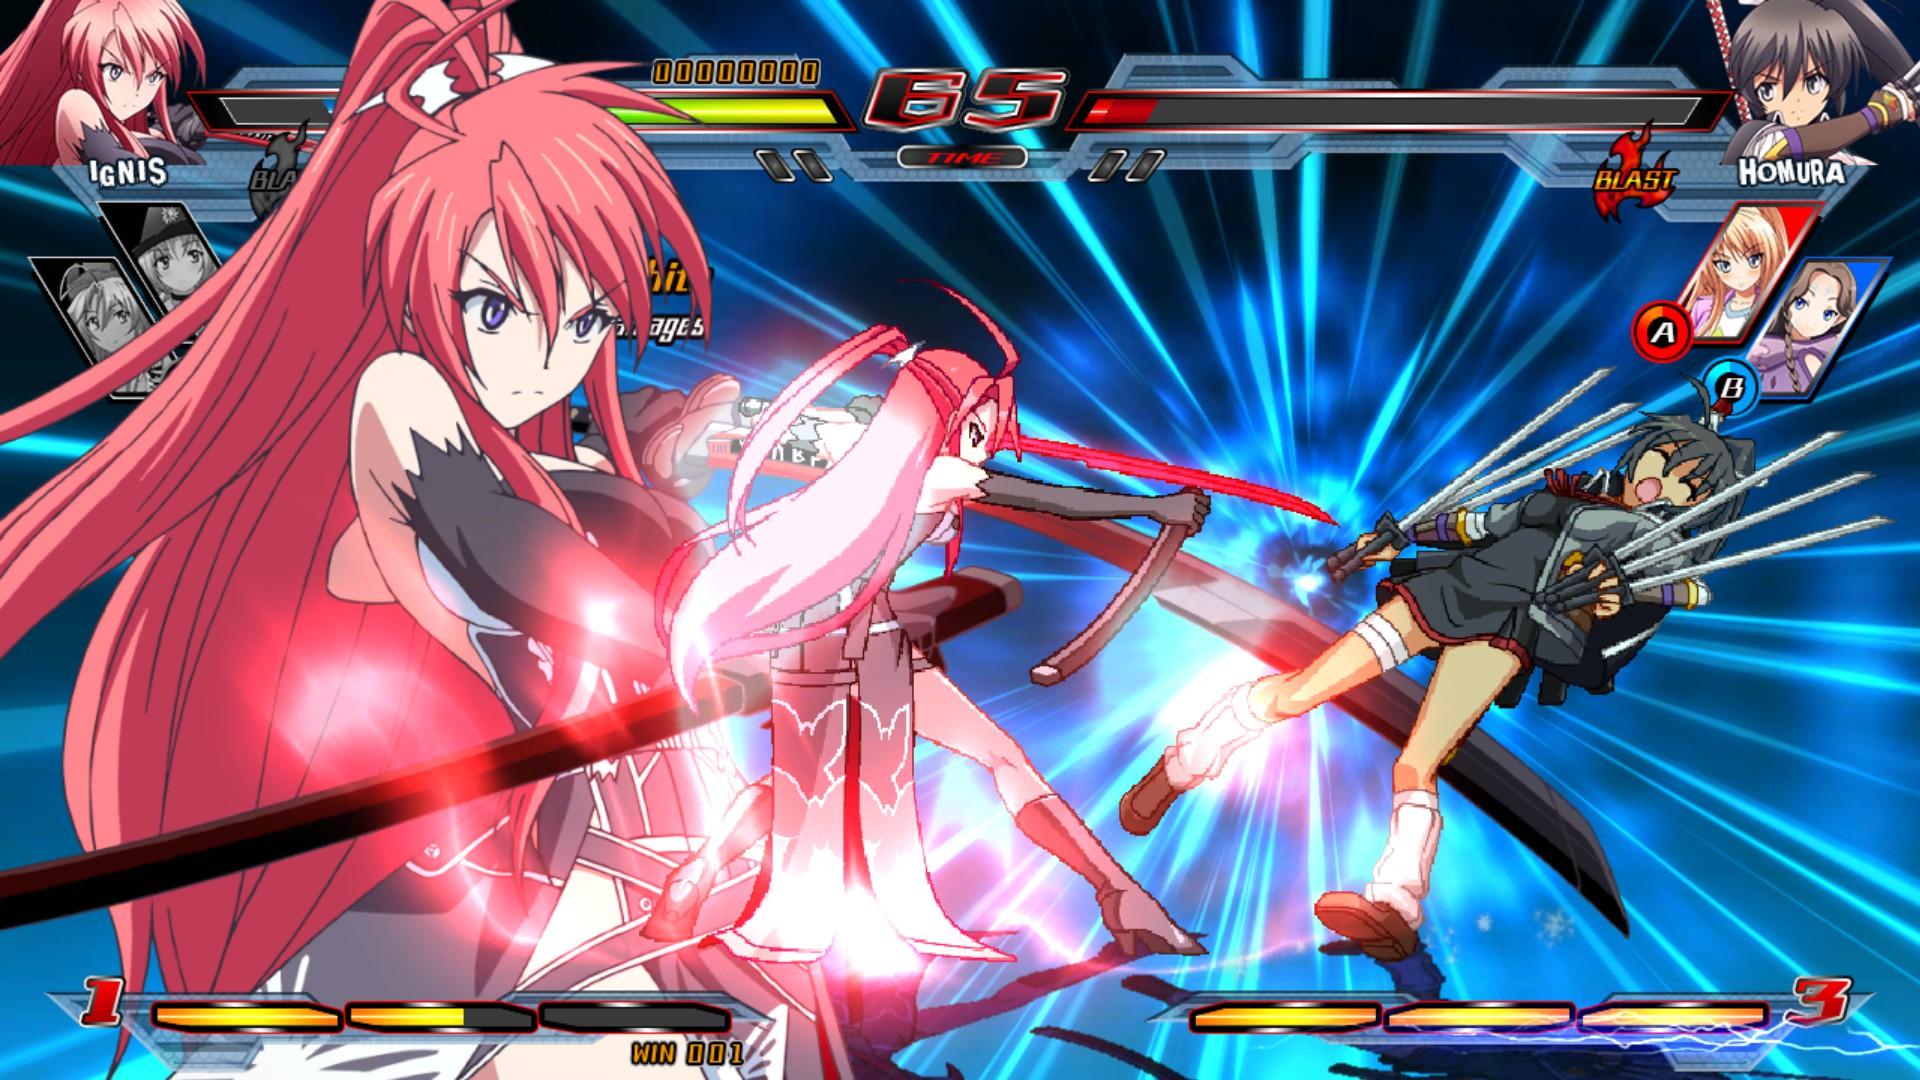 nitroplus-blasterz-heroines-infinite-duel-screenshot-1